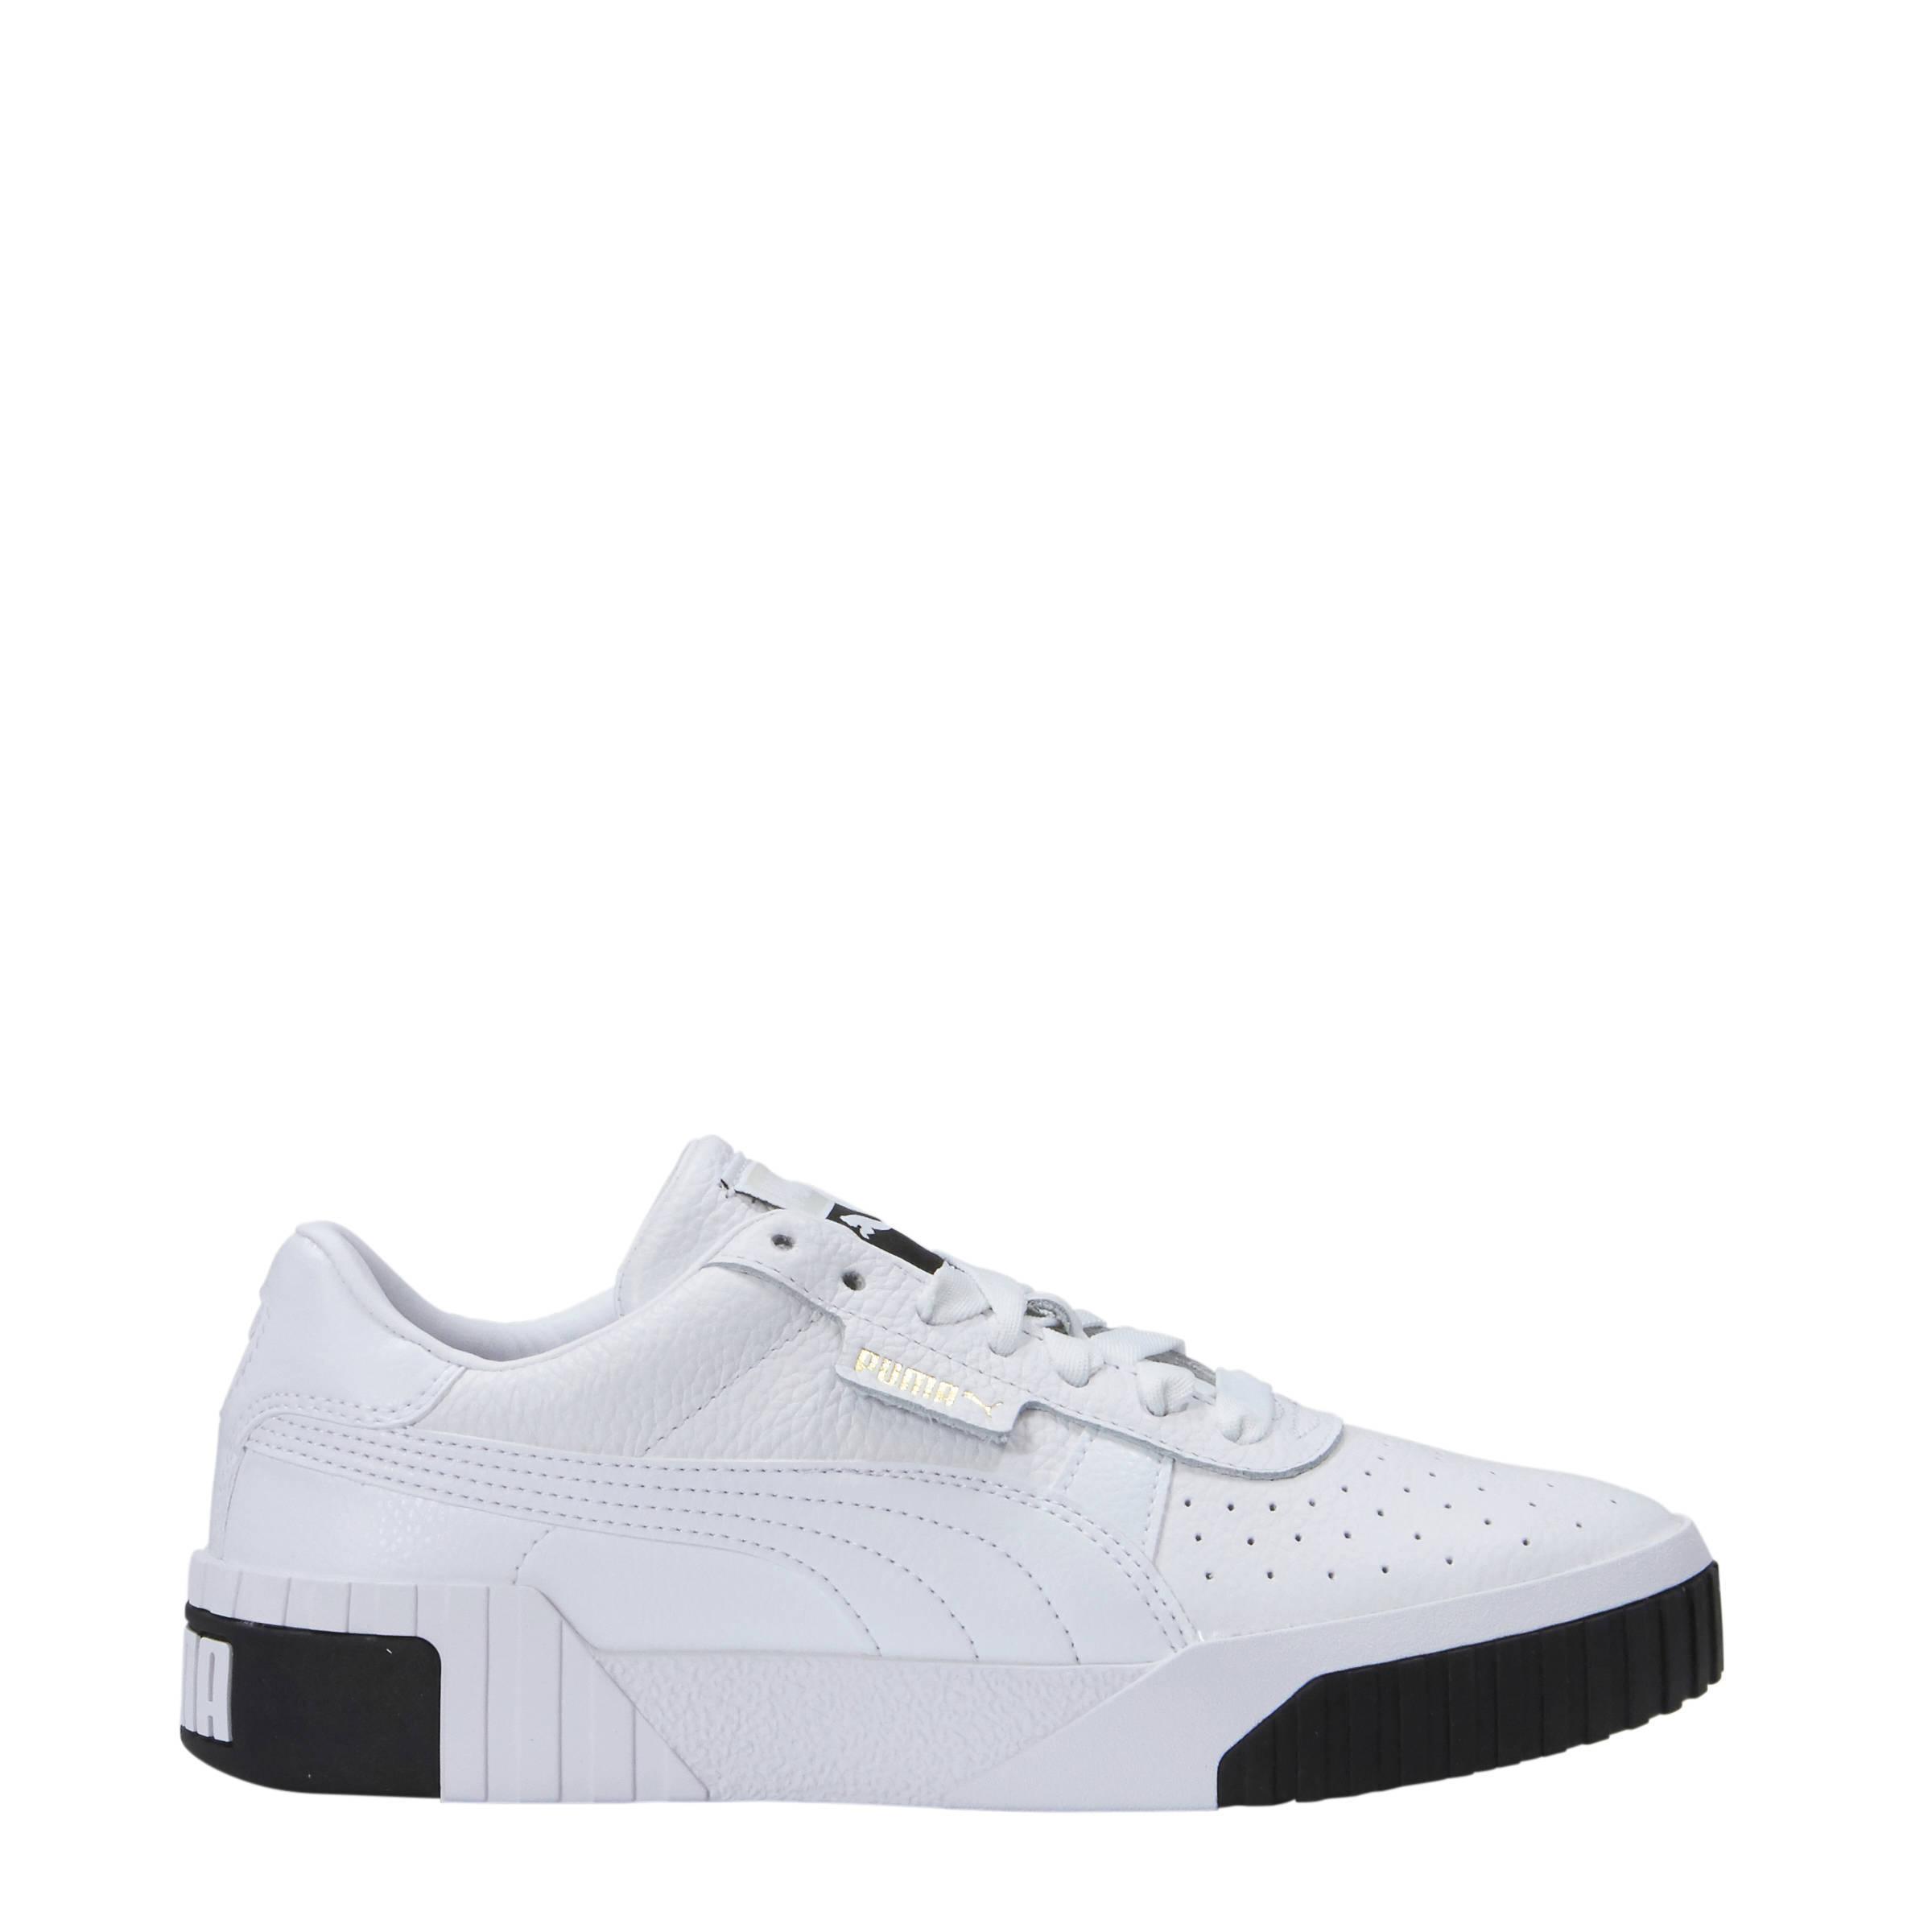 55069fbec97 Puma sneakers Cali wit | wehkamp